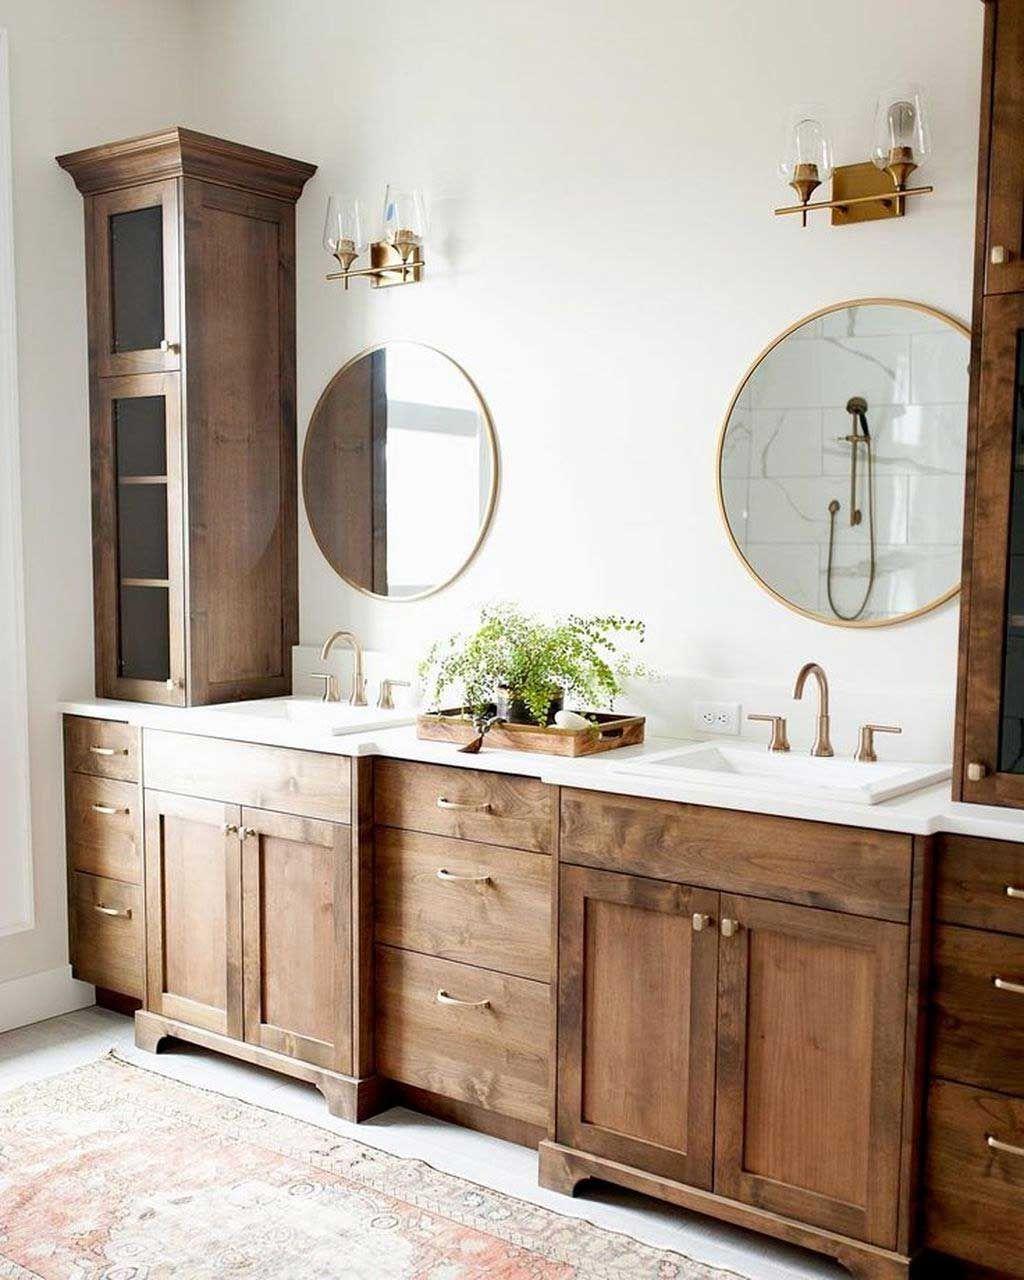 44 Low Cost Farmhouse Bathroom Design Ideas 05 With Lamp